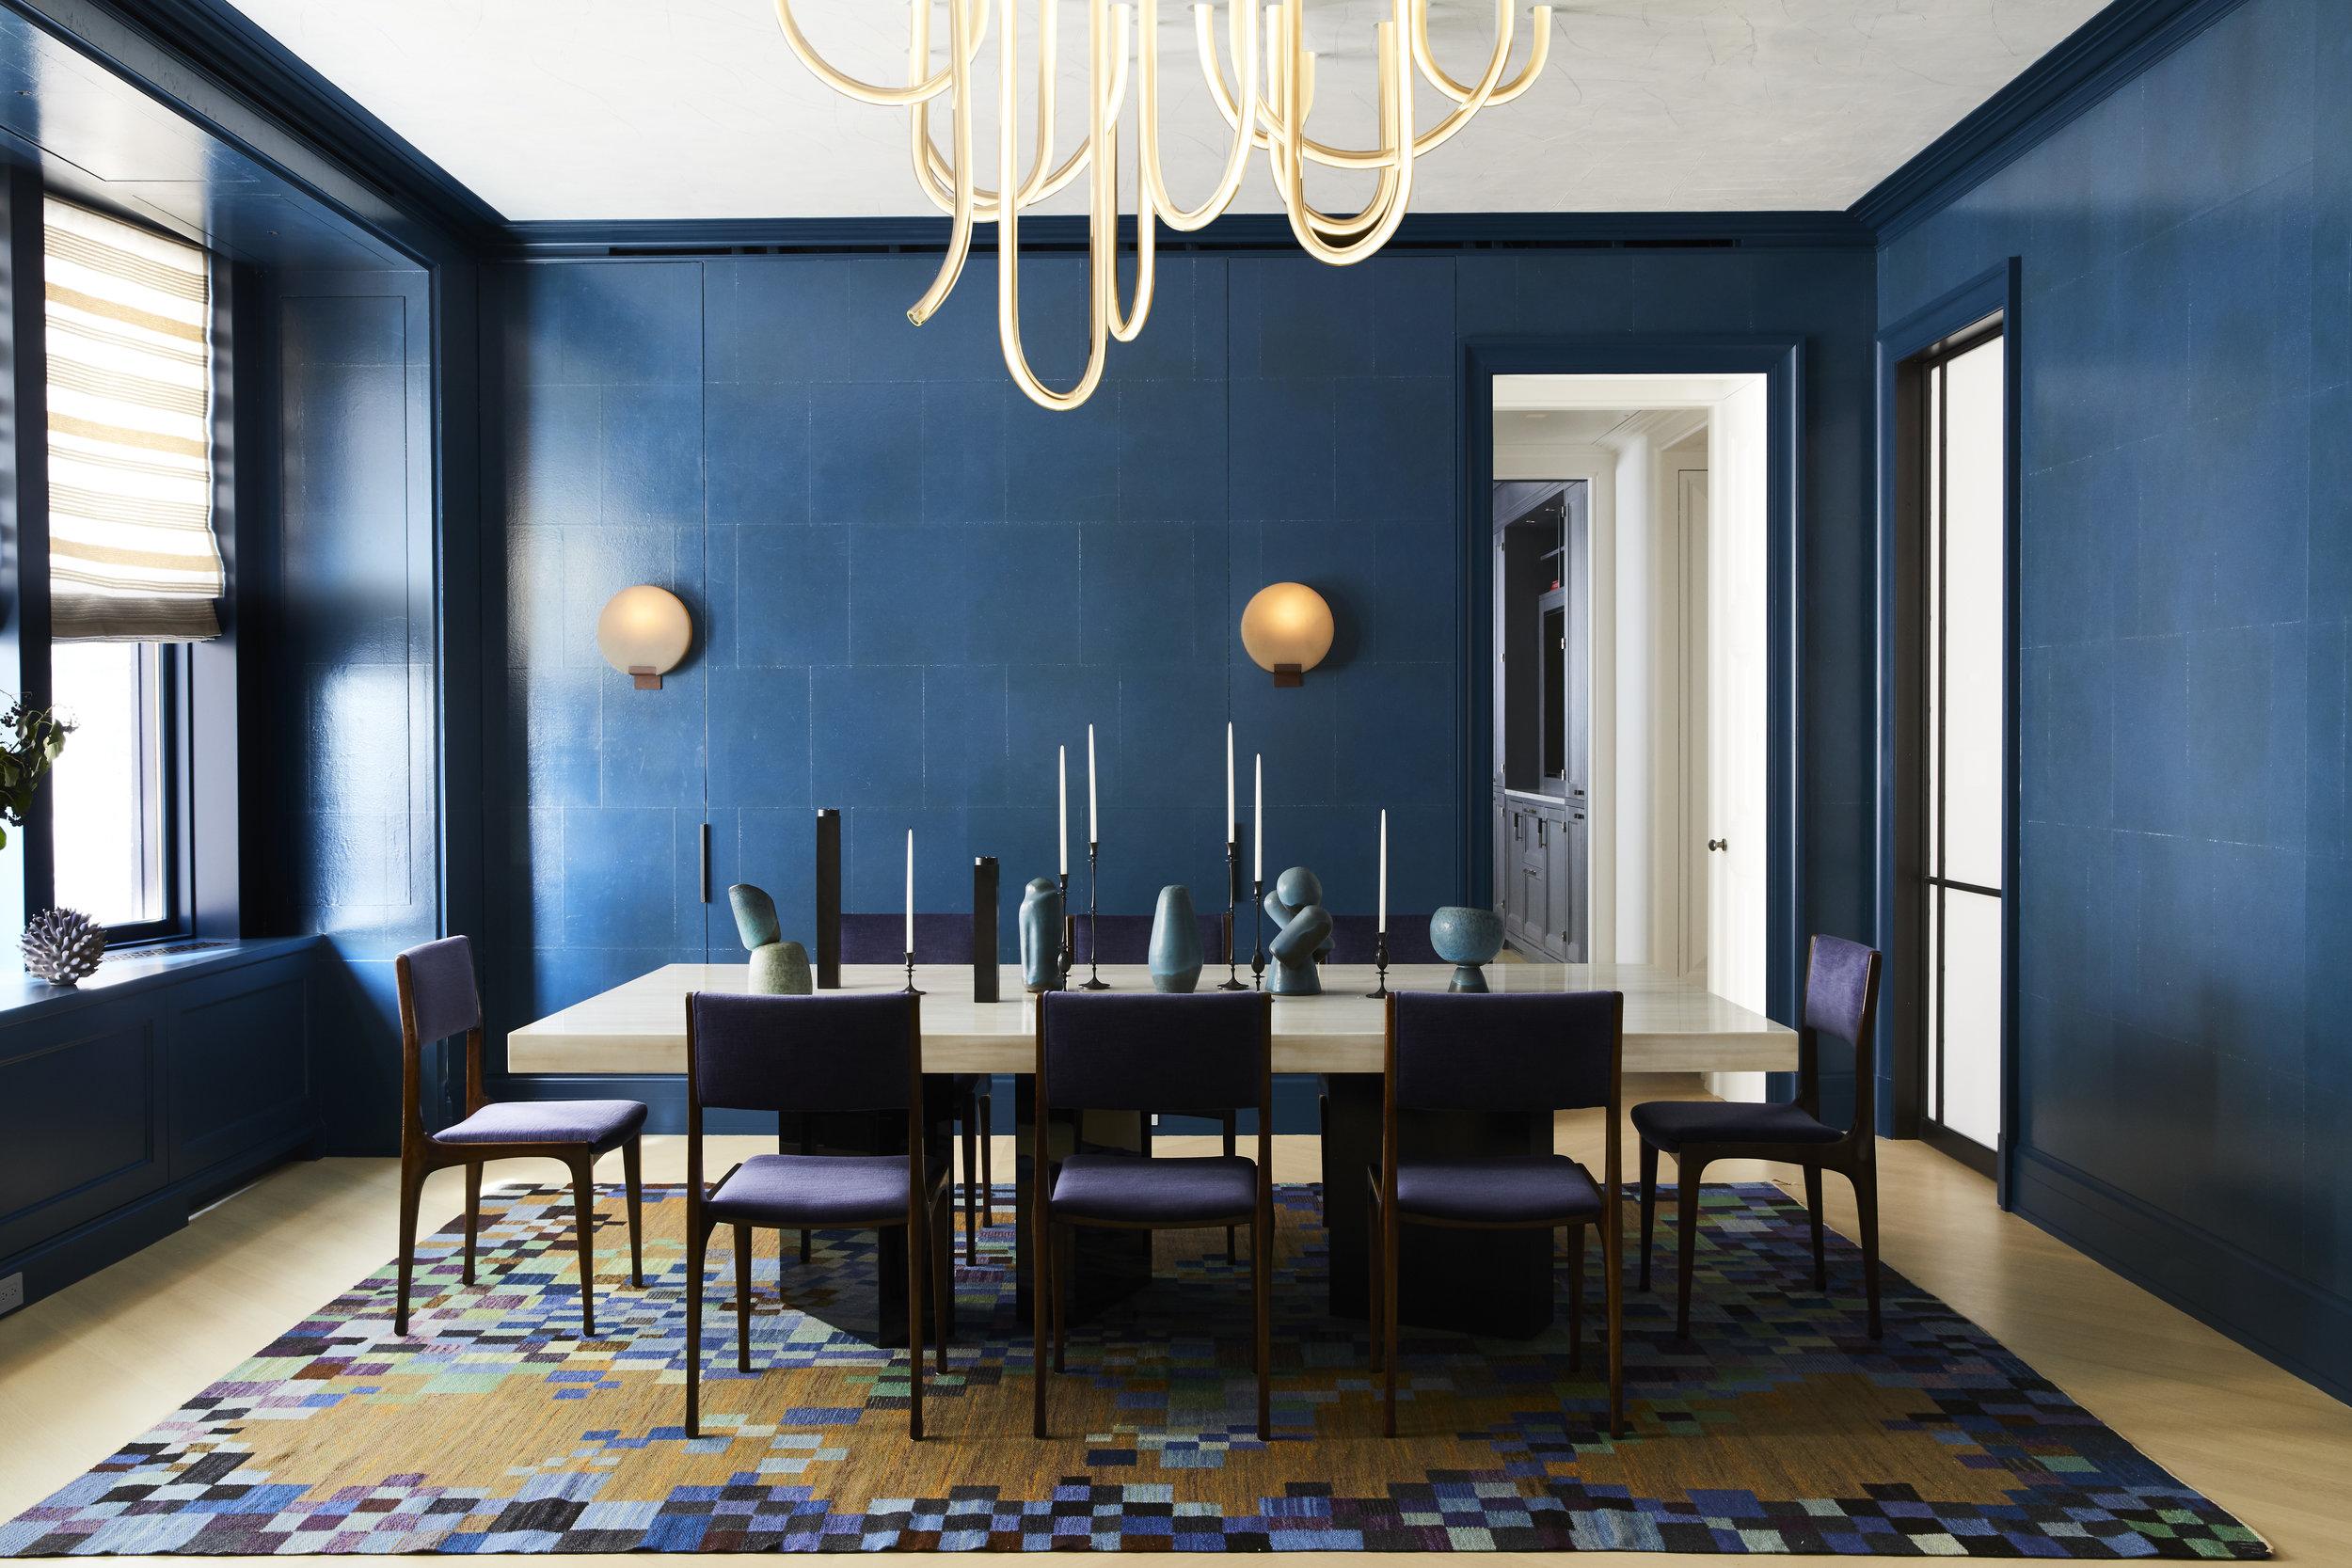 88_CPW_Dining_Room_004.jpg